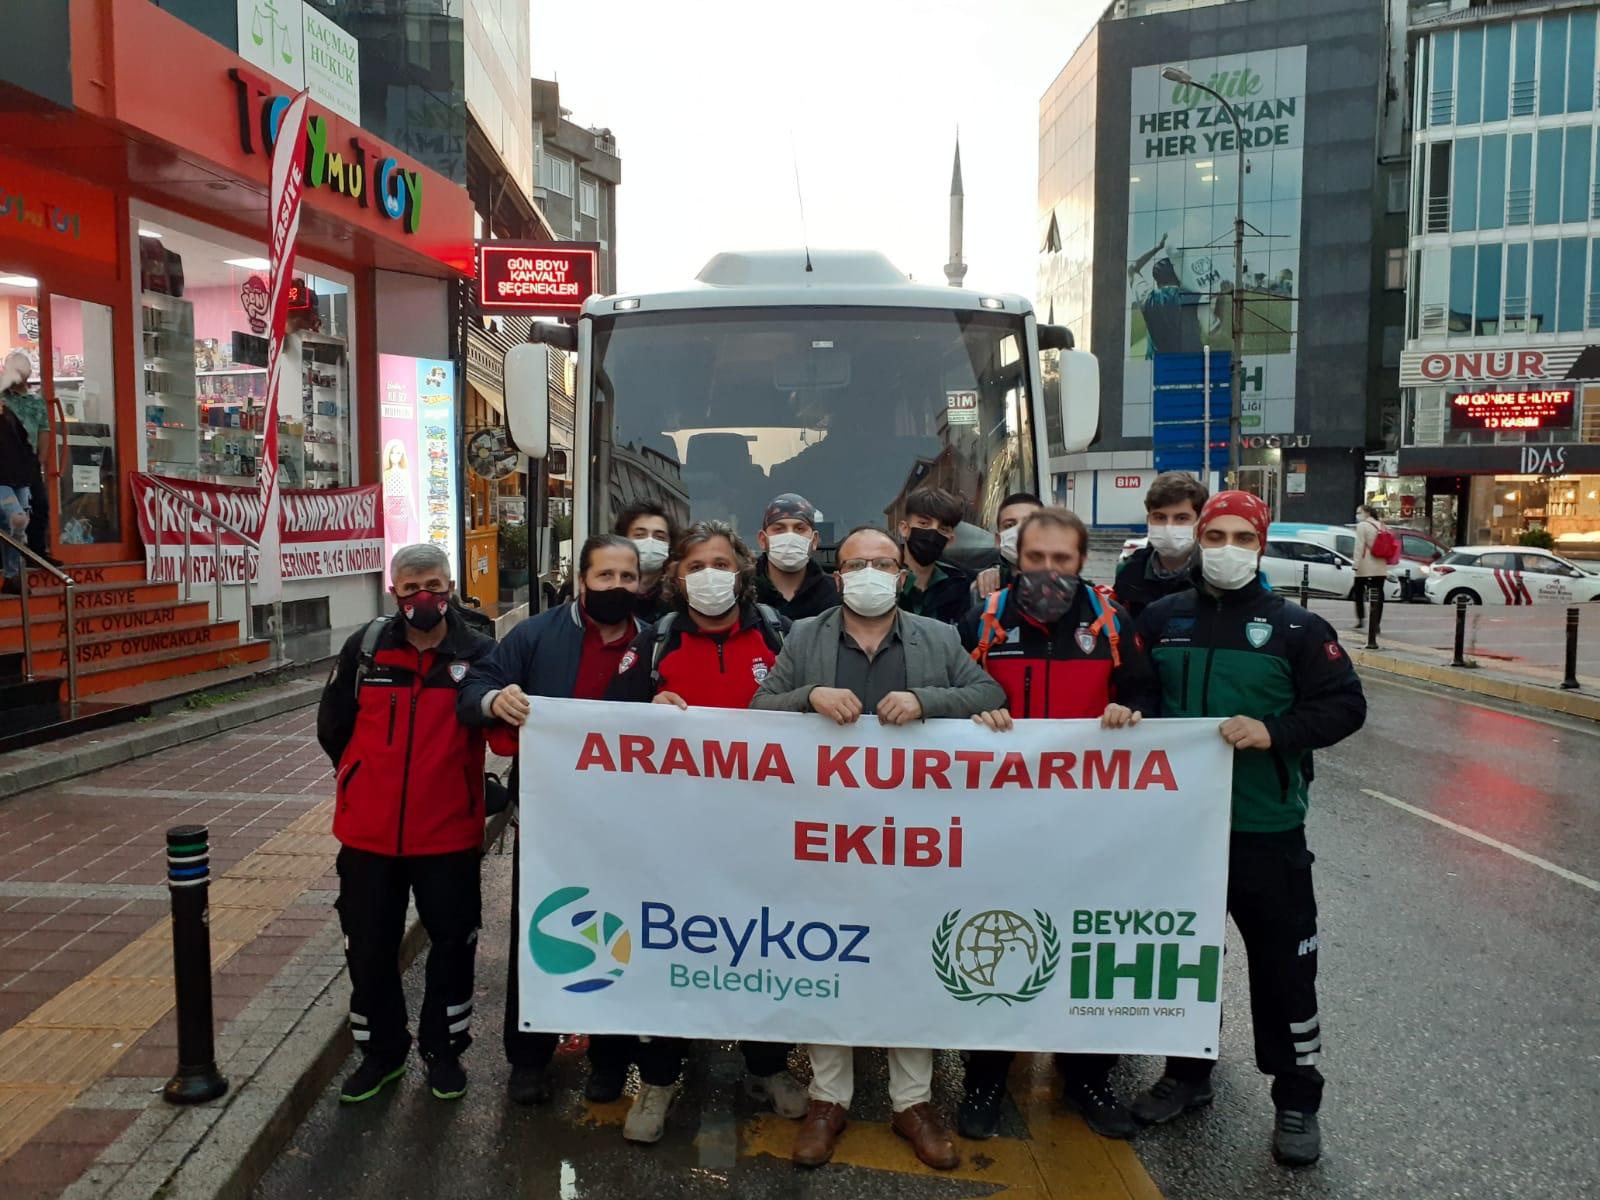 Beykoz'dan İzmir'e harekete geçtiler